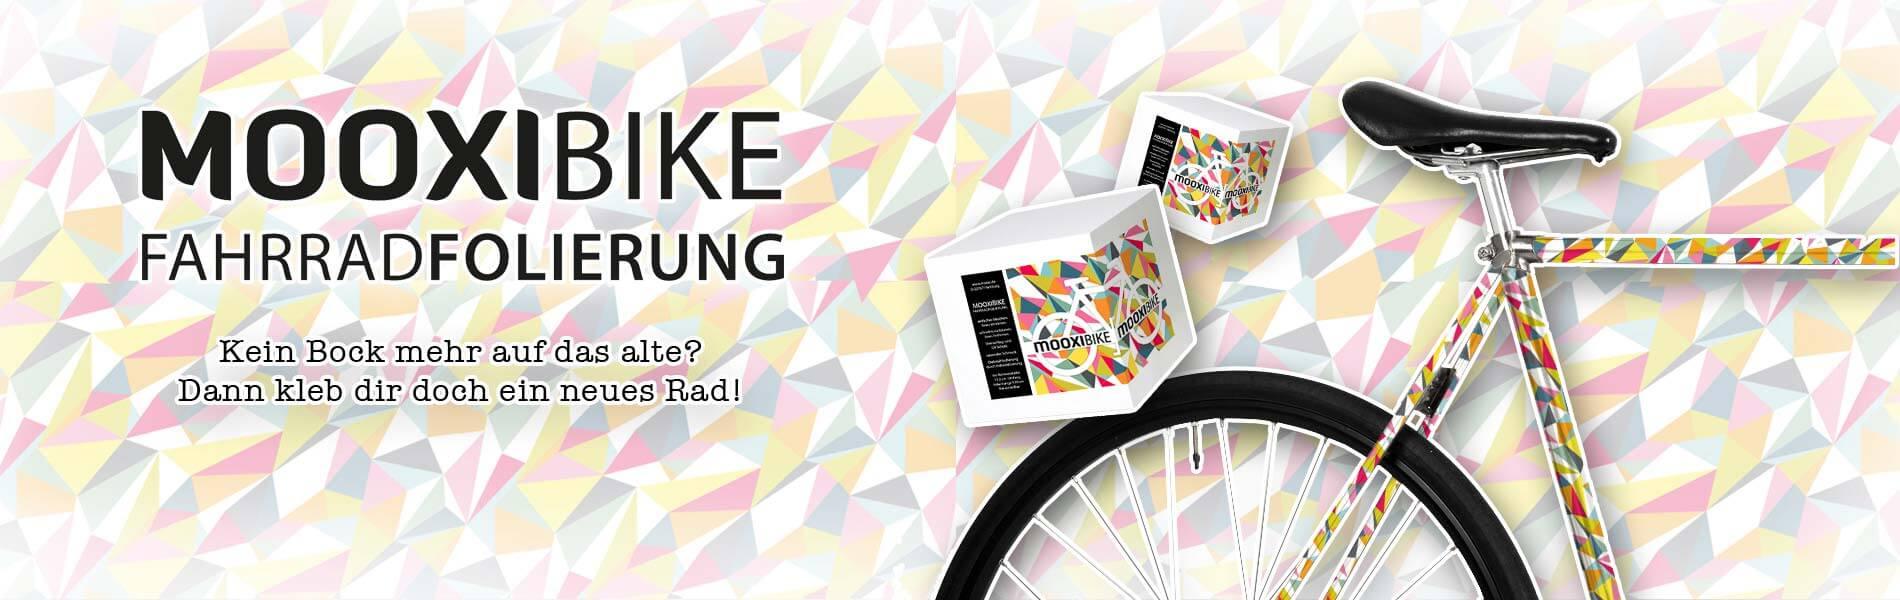 MooxiBike - Fahrradfolie